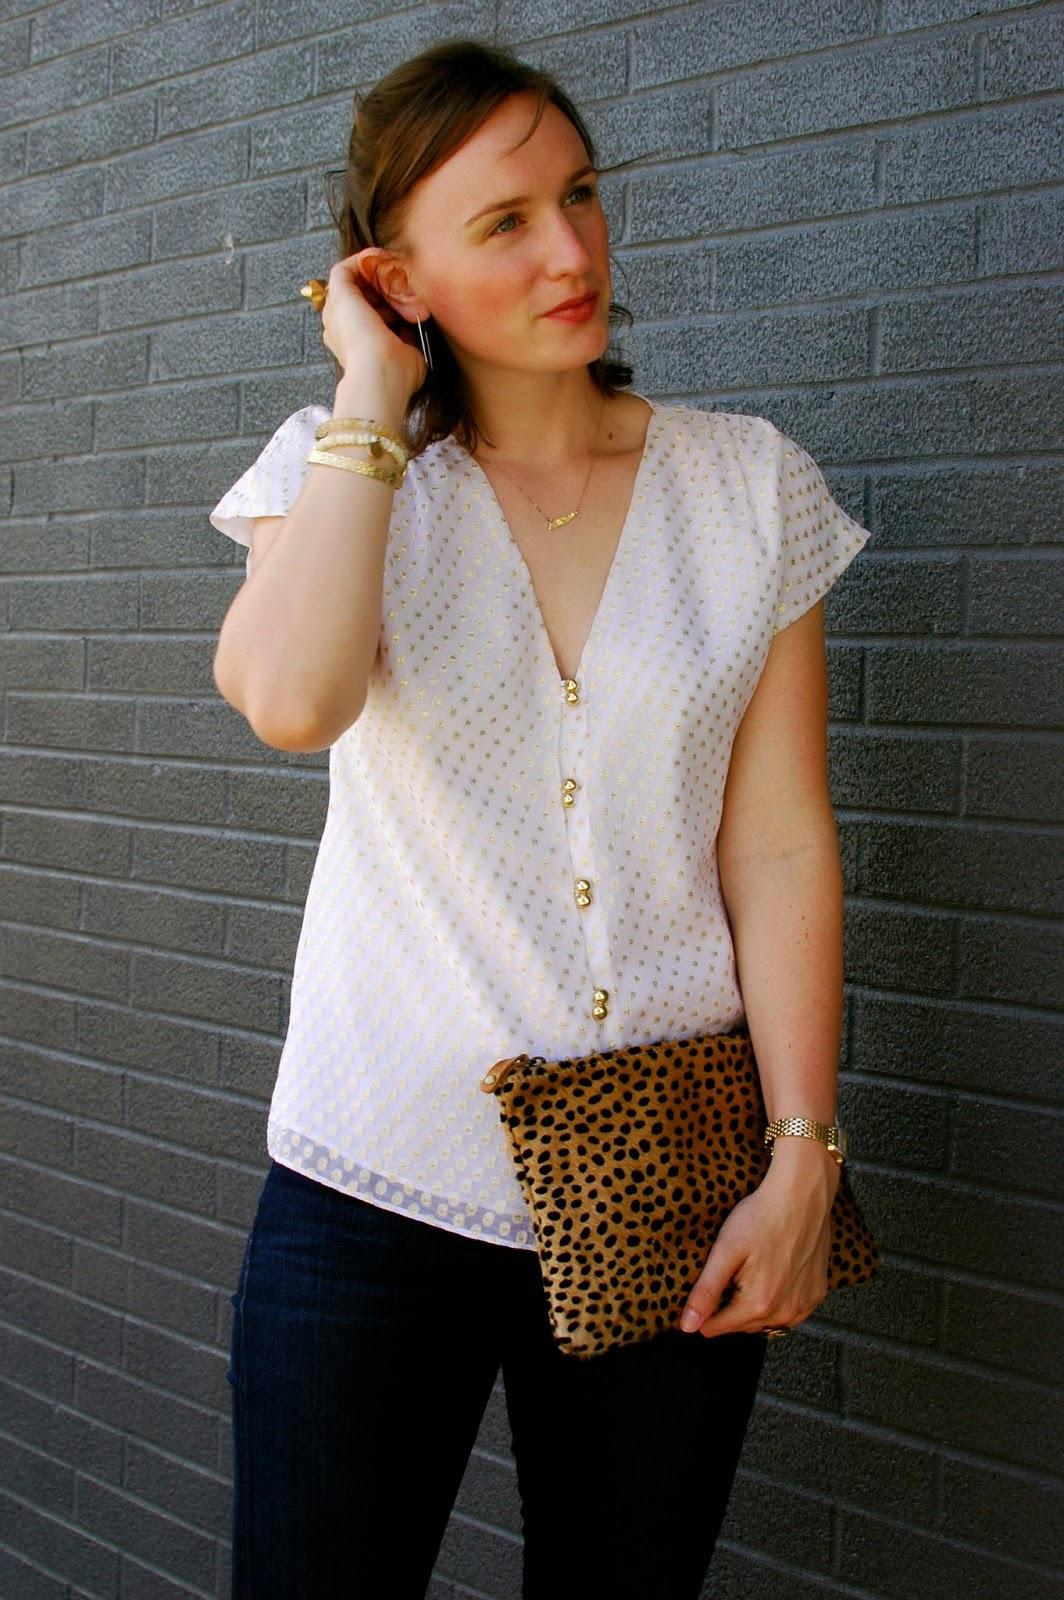 Silk Top, Cheetah Clutch, TN Necklace, Boutique MODA.  MAU Jewelry, LA, Nashville Style